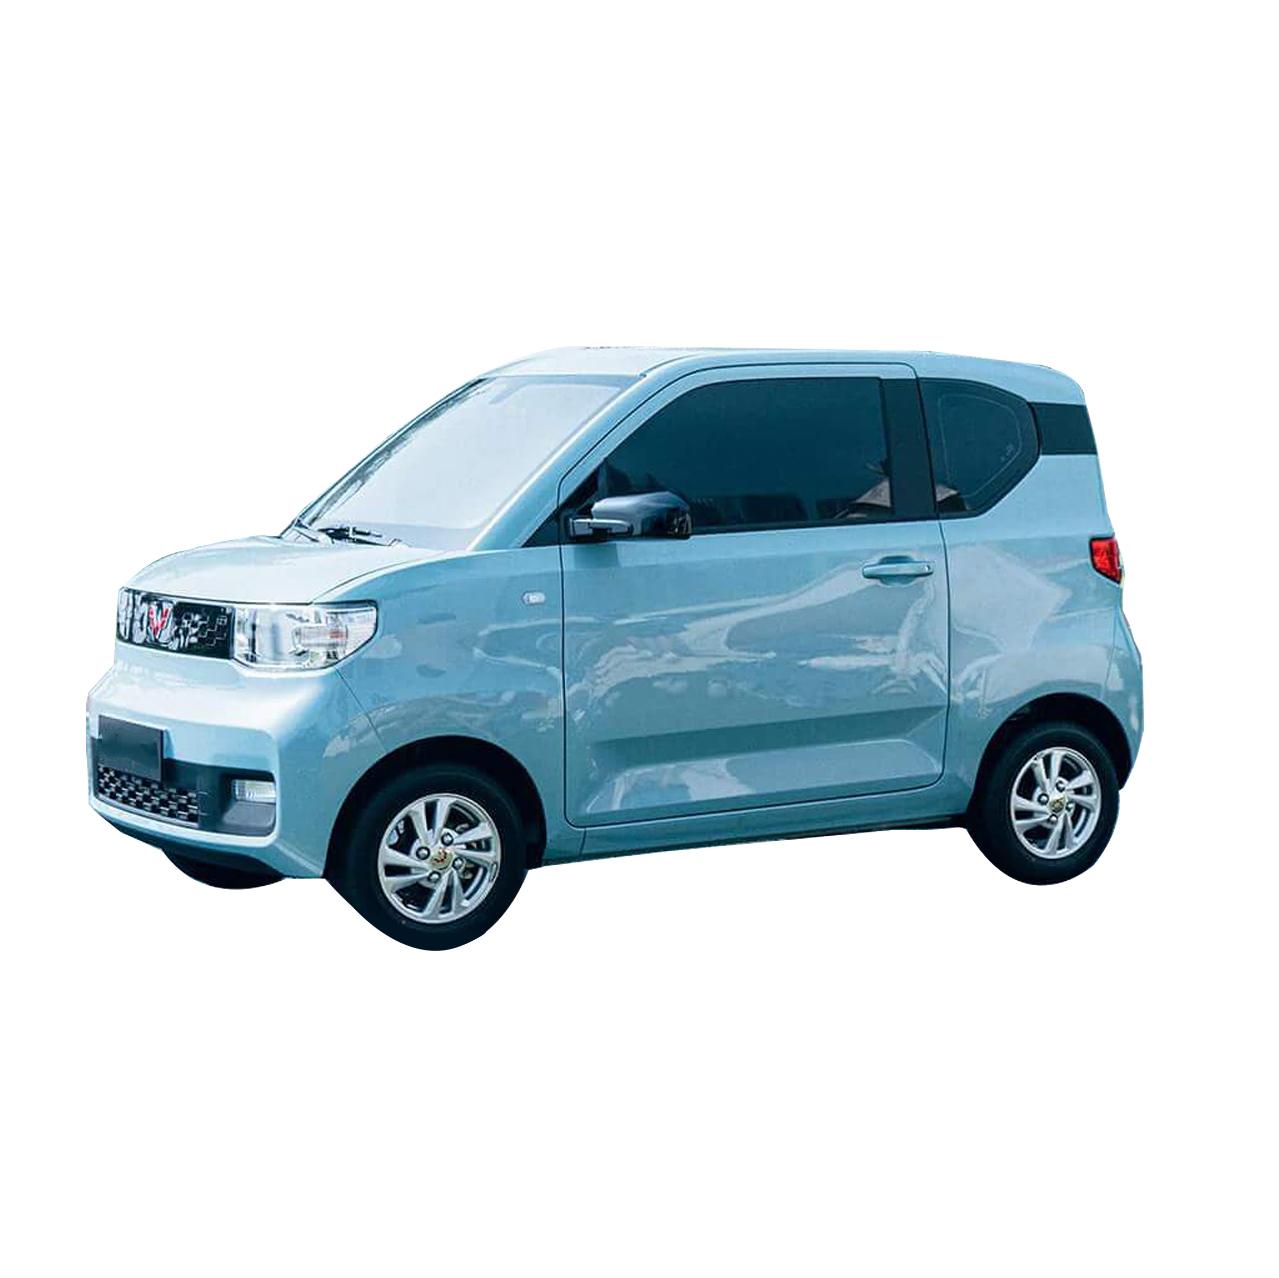 Wuling Hongguang mini ev 100km/h lithium battery 2020 electric new car